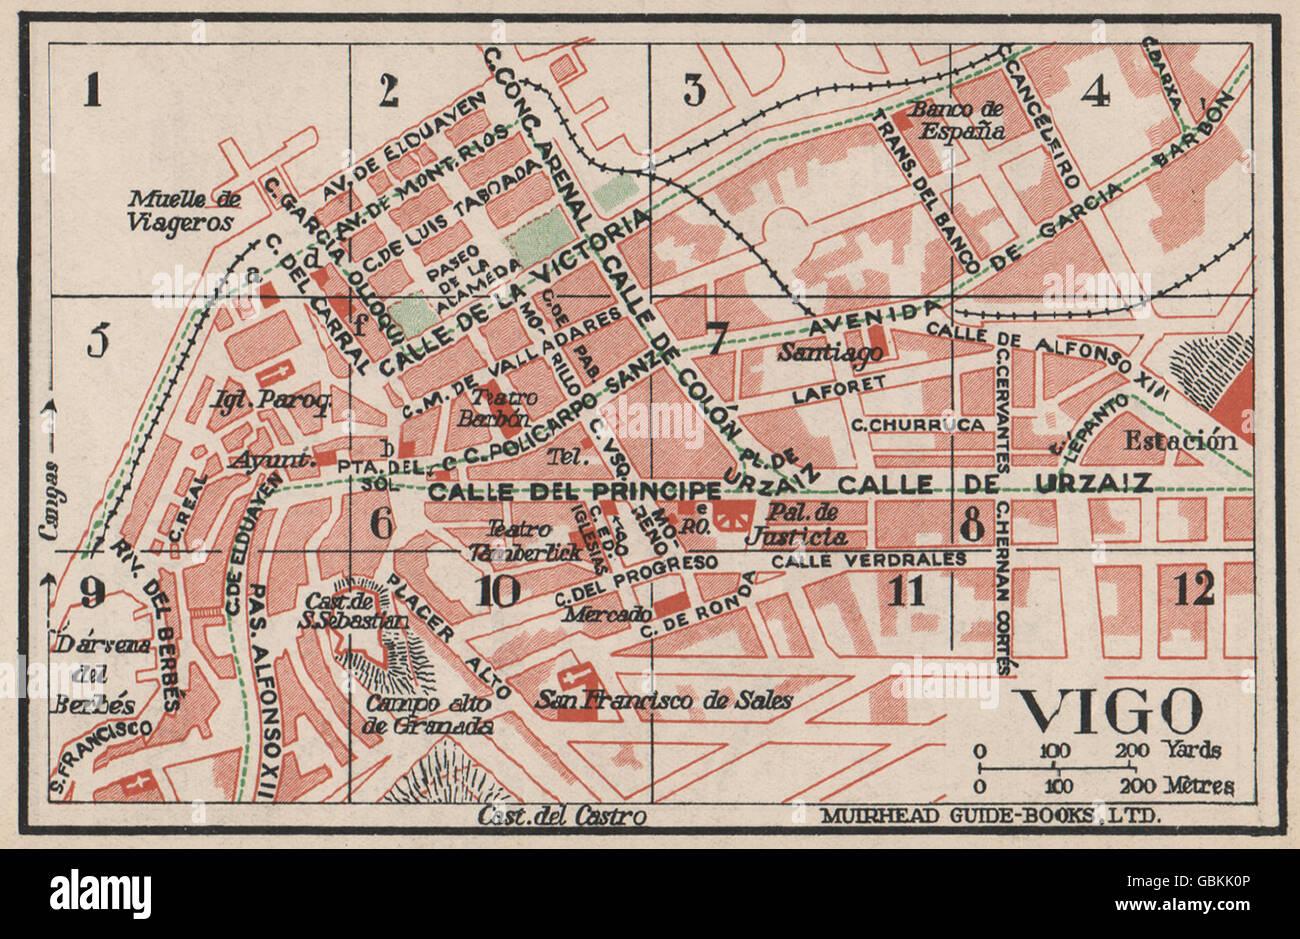 Vigo Vintage Town City Map Plan Spain 1930 Stock Photo 110455430